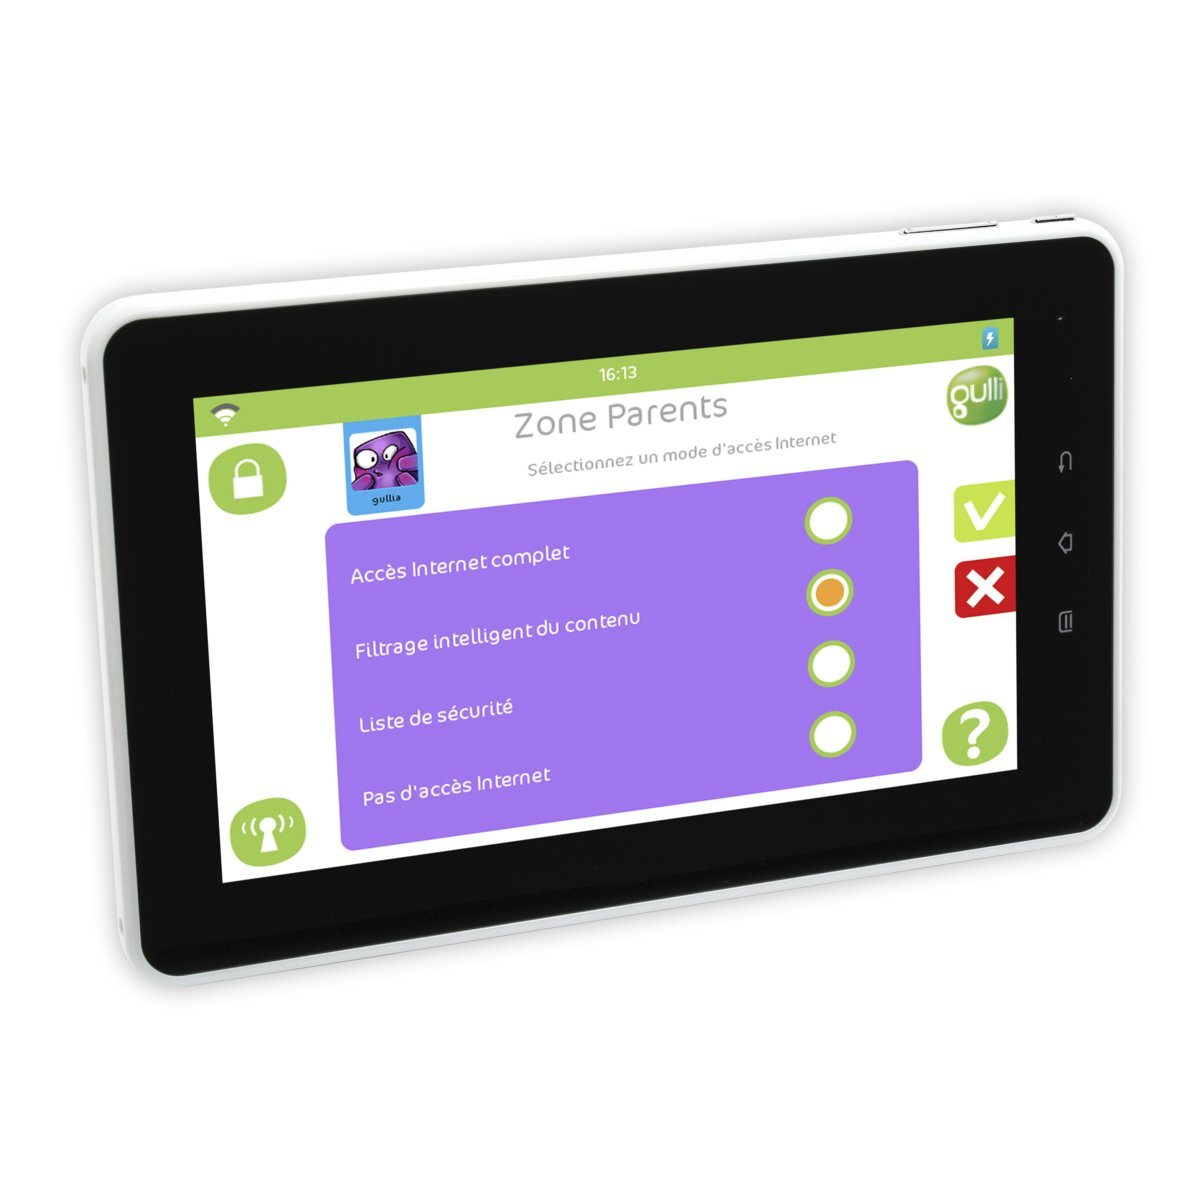 tablette tactile by gulli zone parents. Black Bedroom Furniture Sets. Home Design Ideas